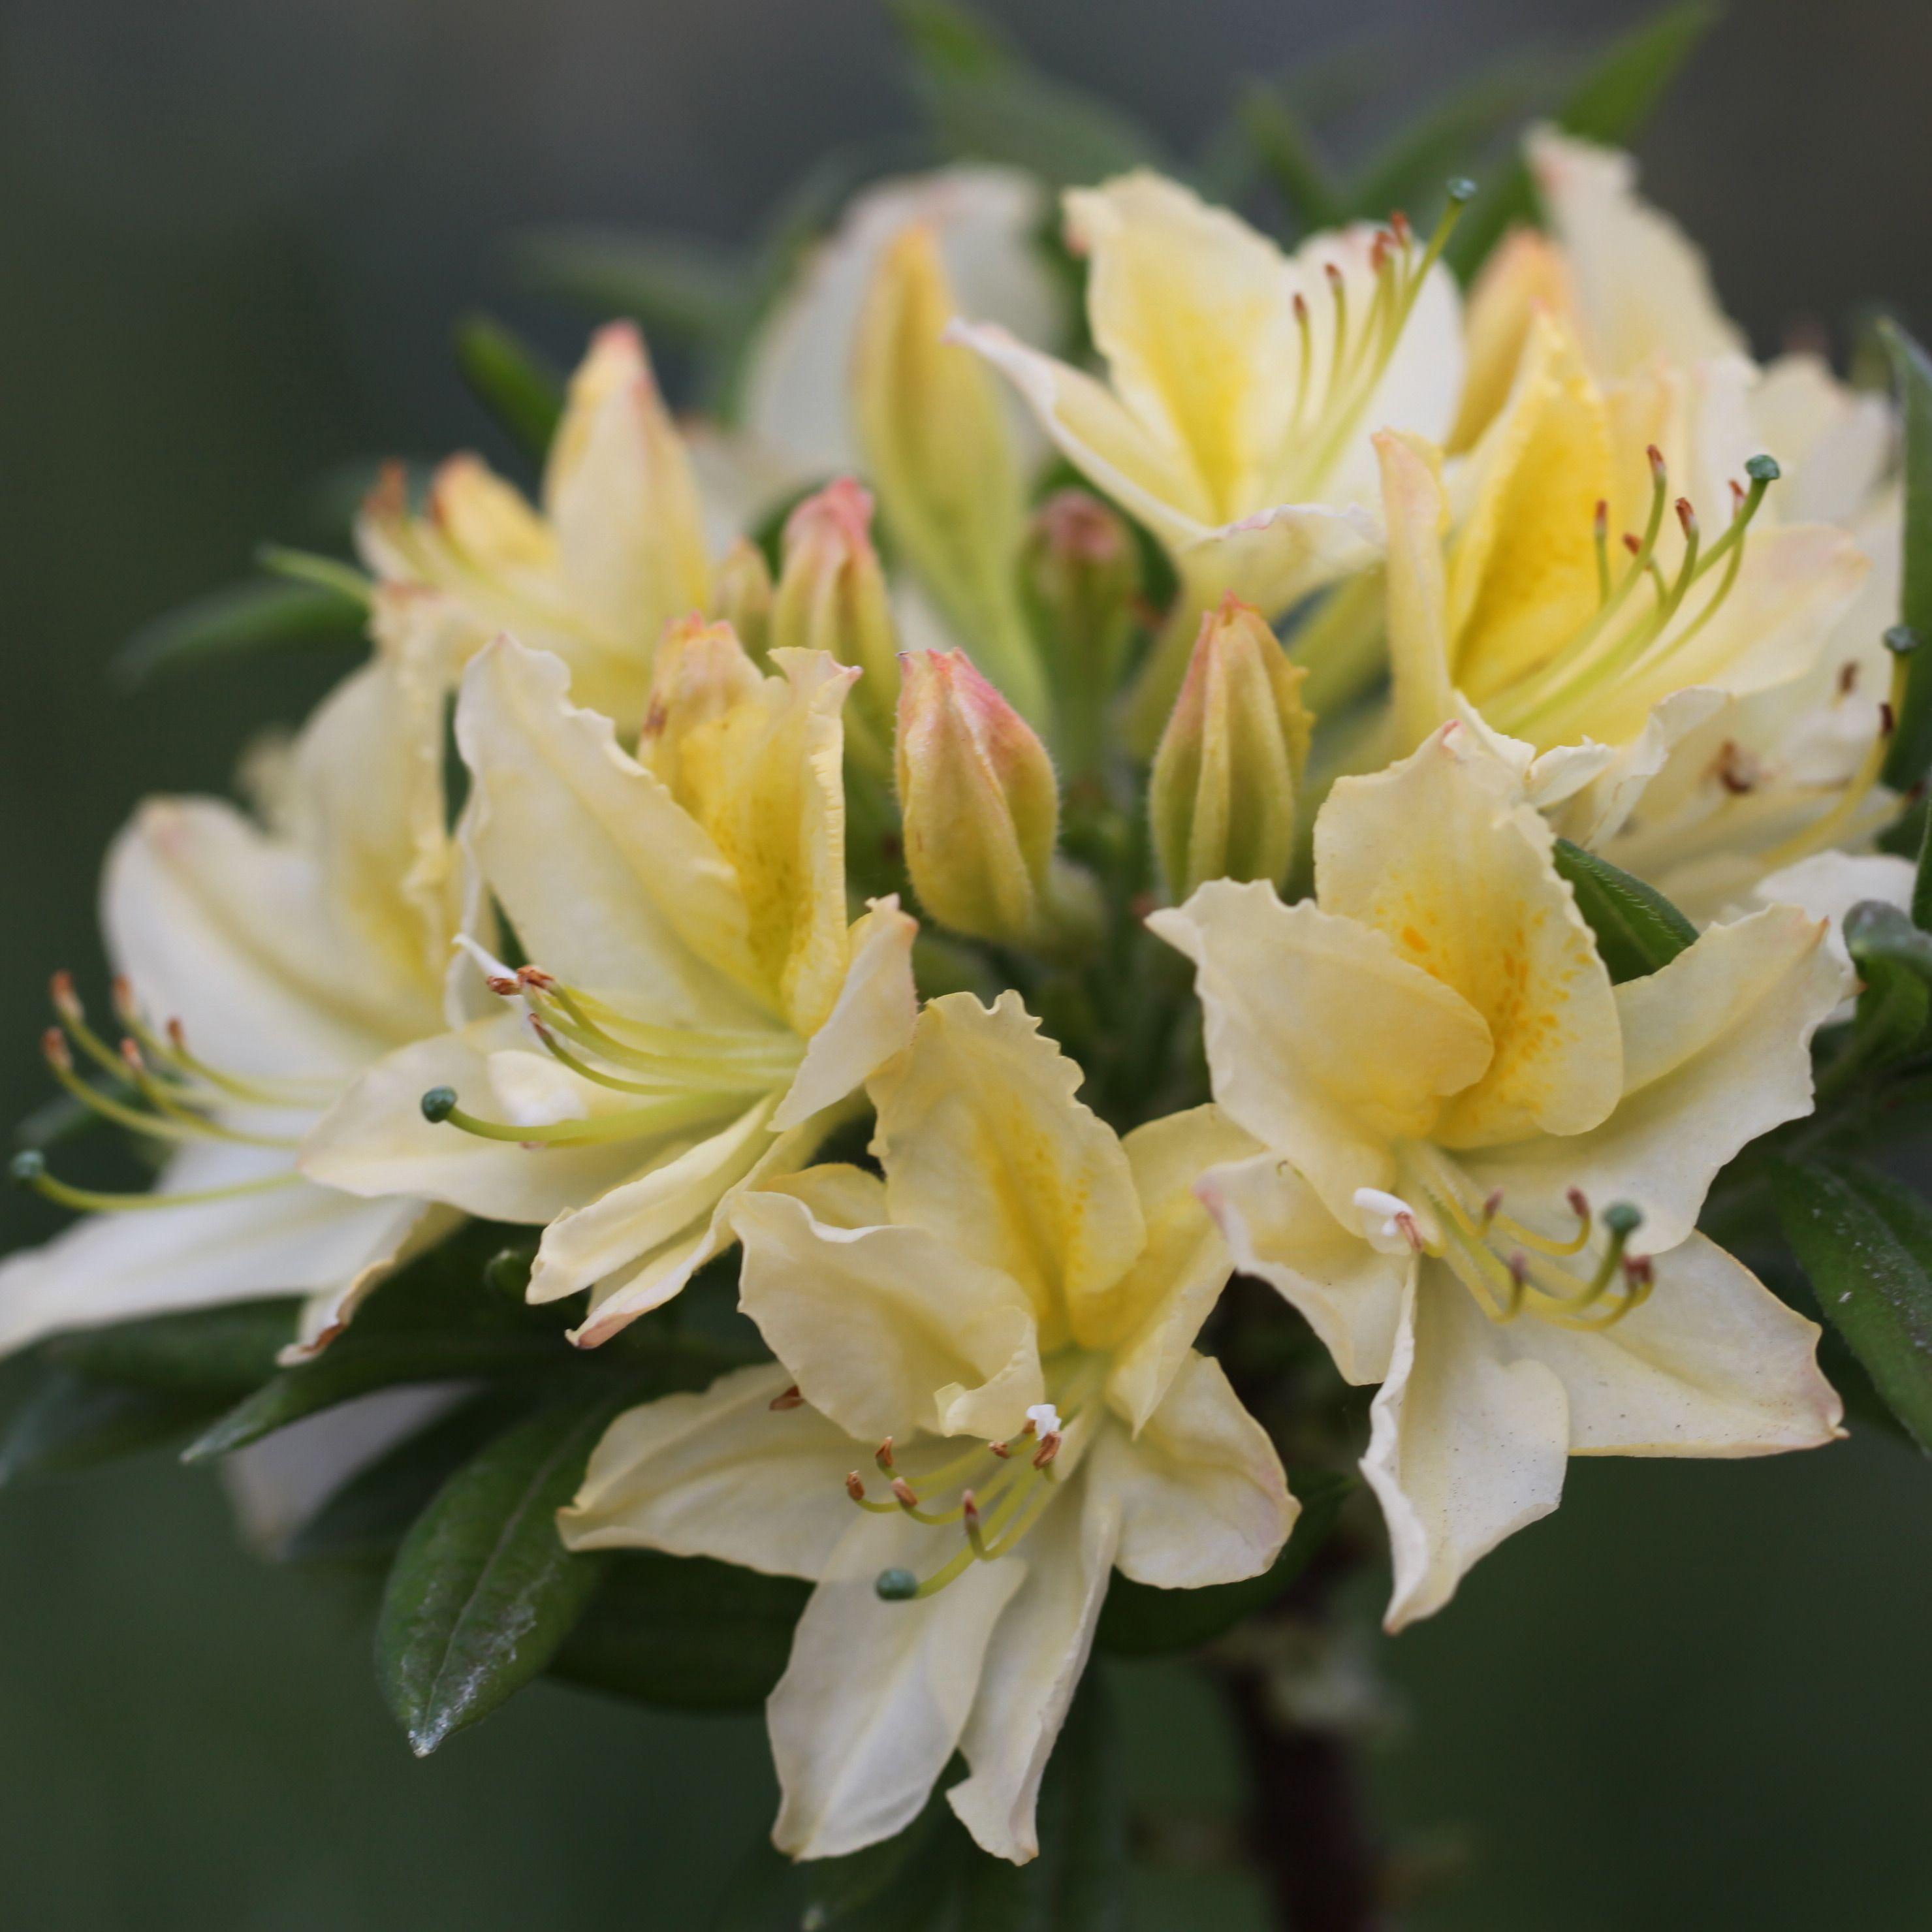 Deciduous Azalea Rhs Azaleas Garden Shrubs Rhododendron